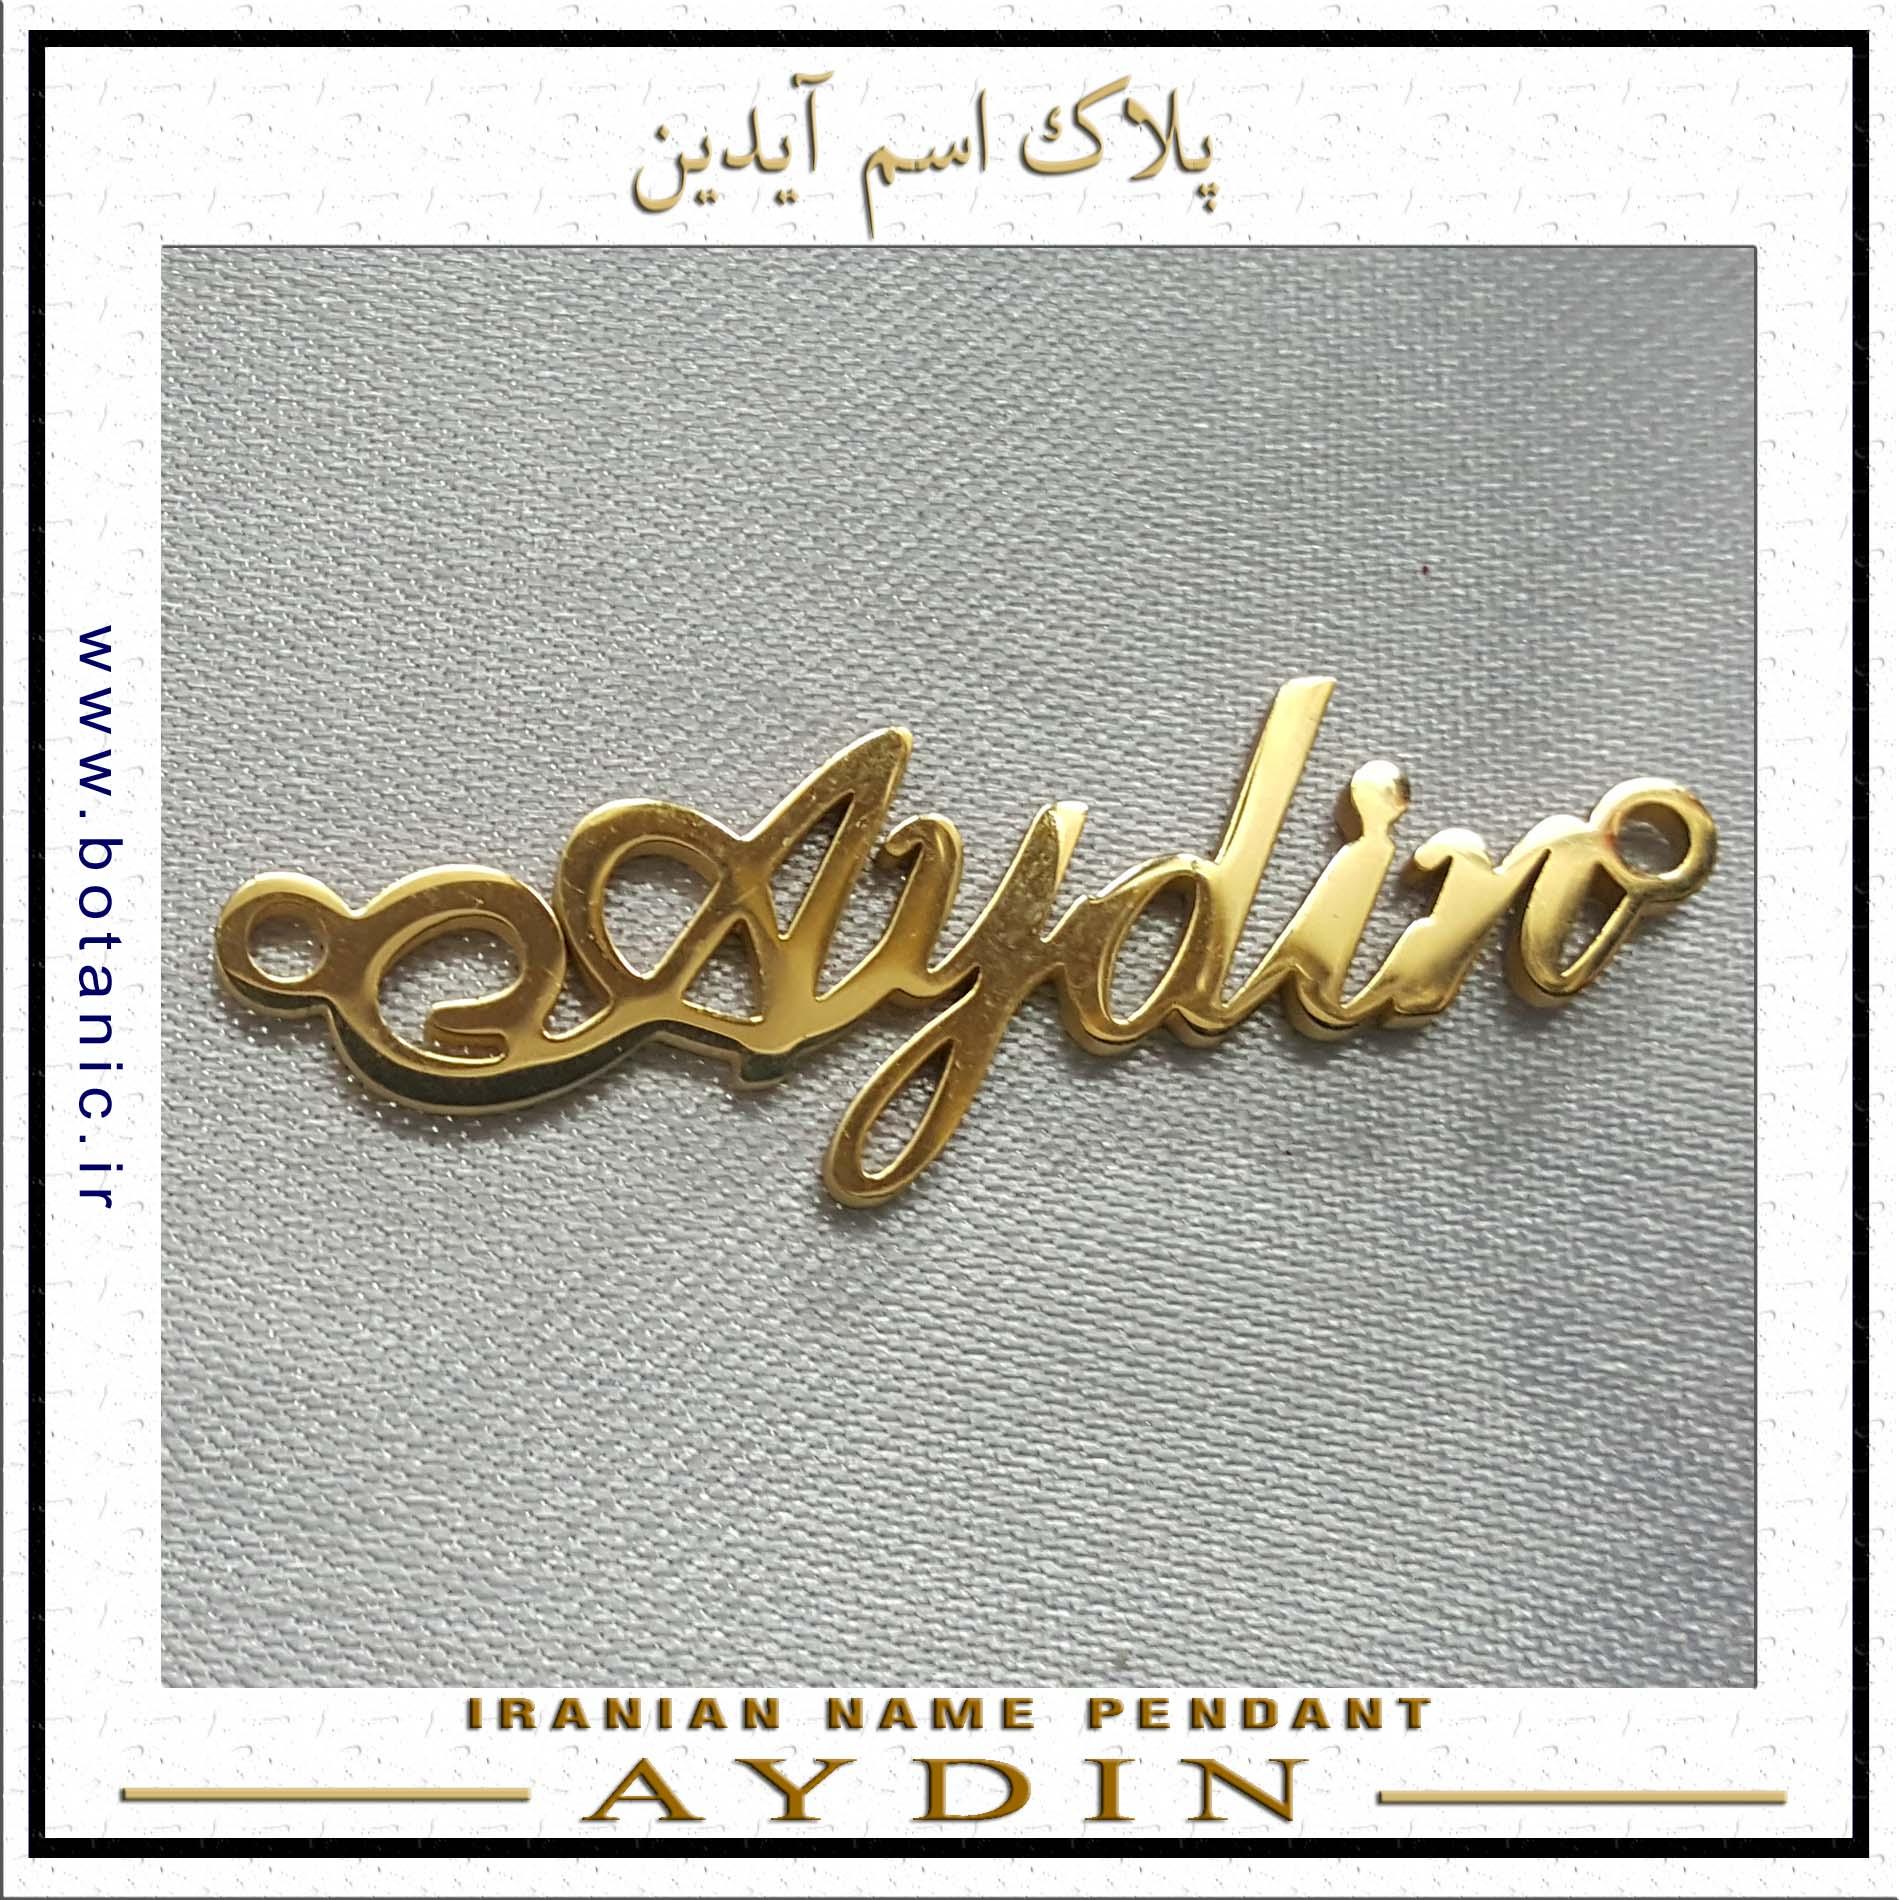 Iranian Name Pendant Aydin